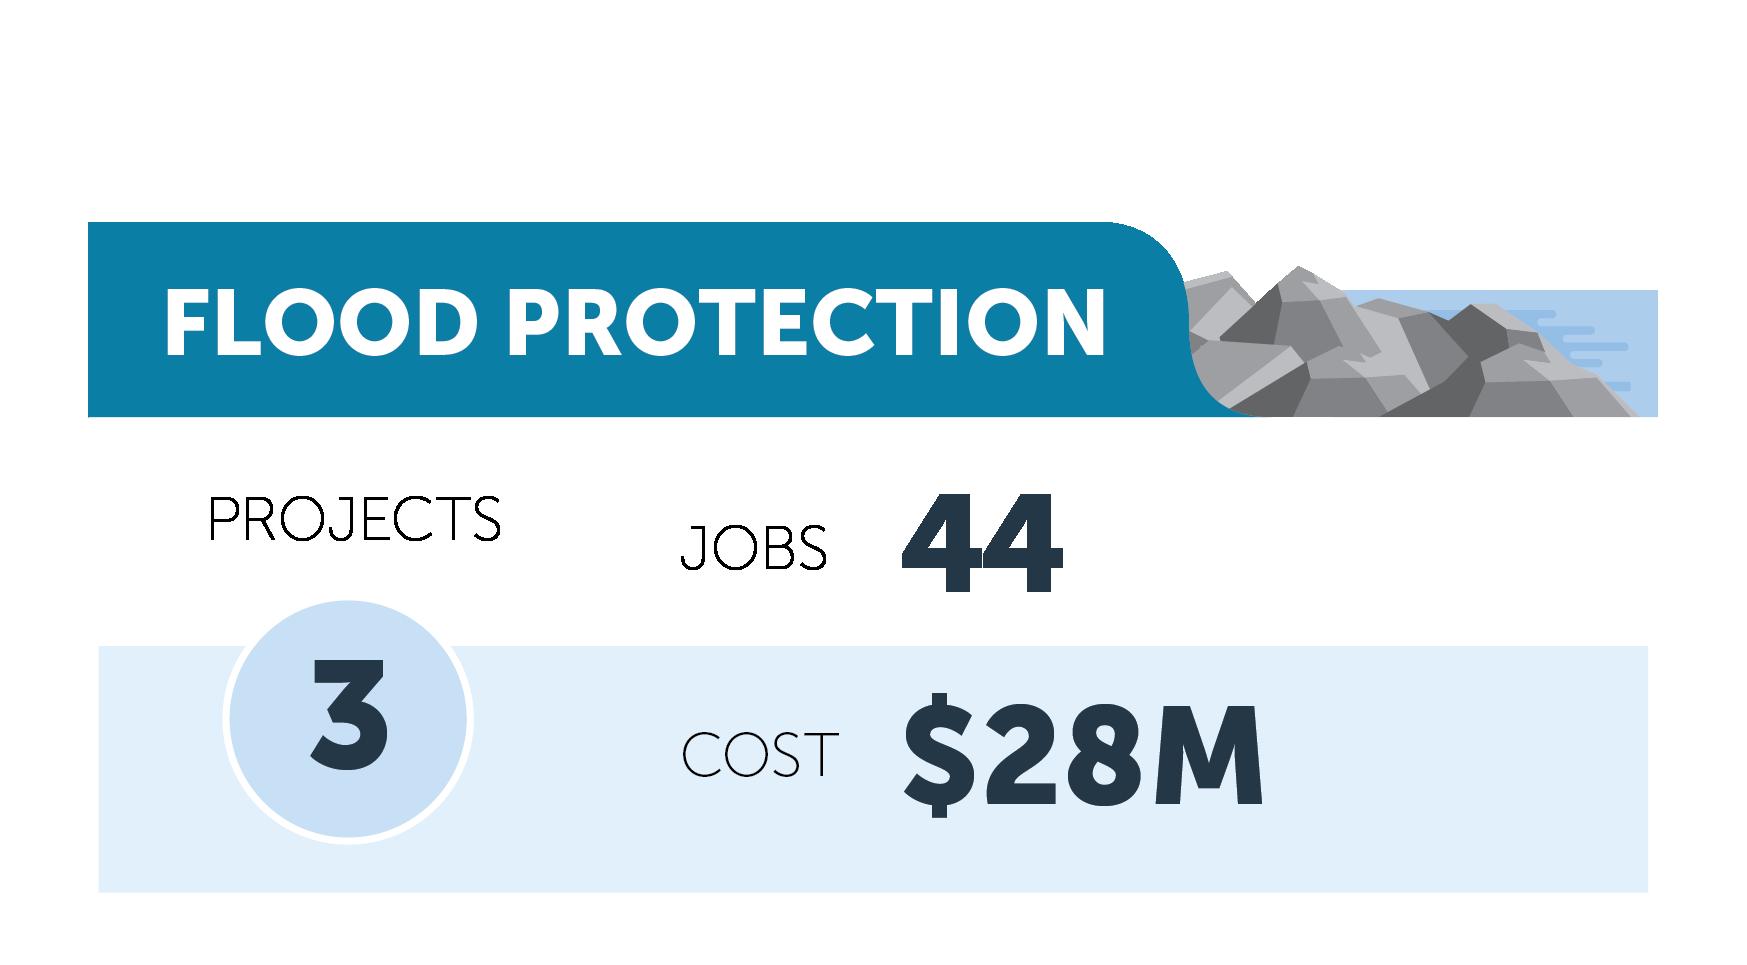 Flood protection figures